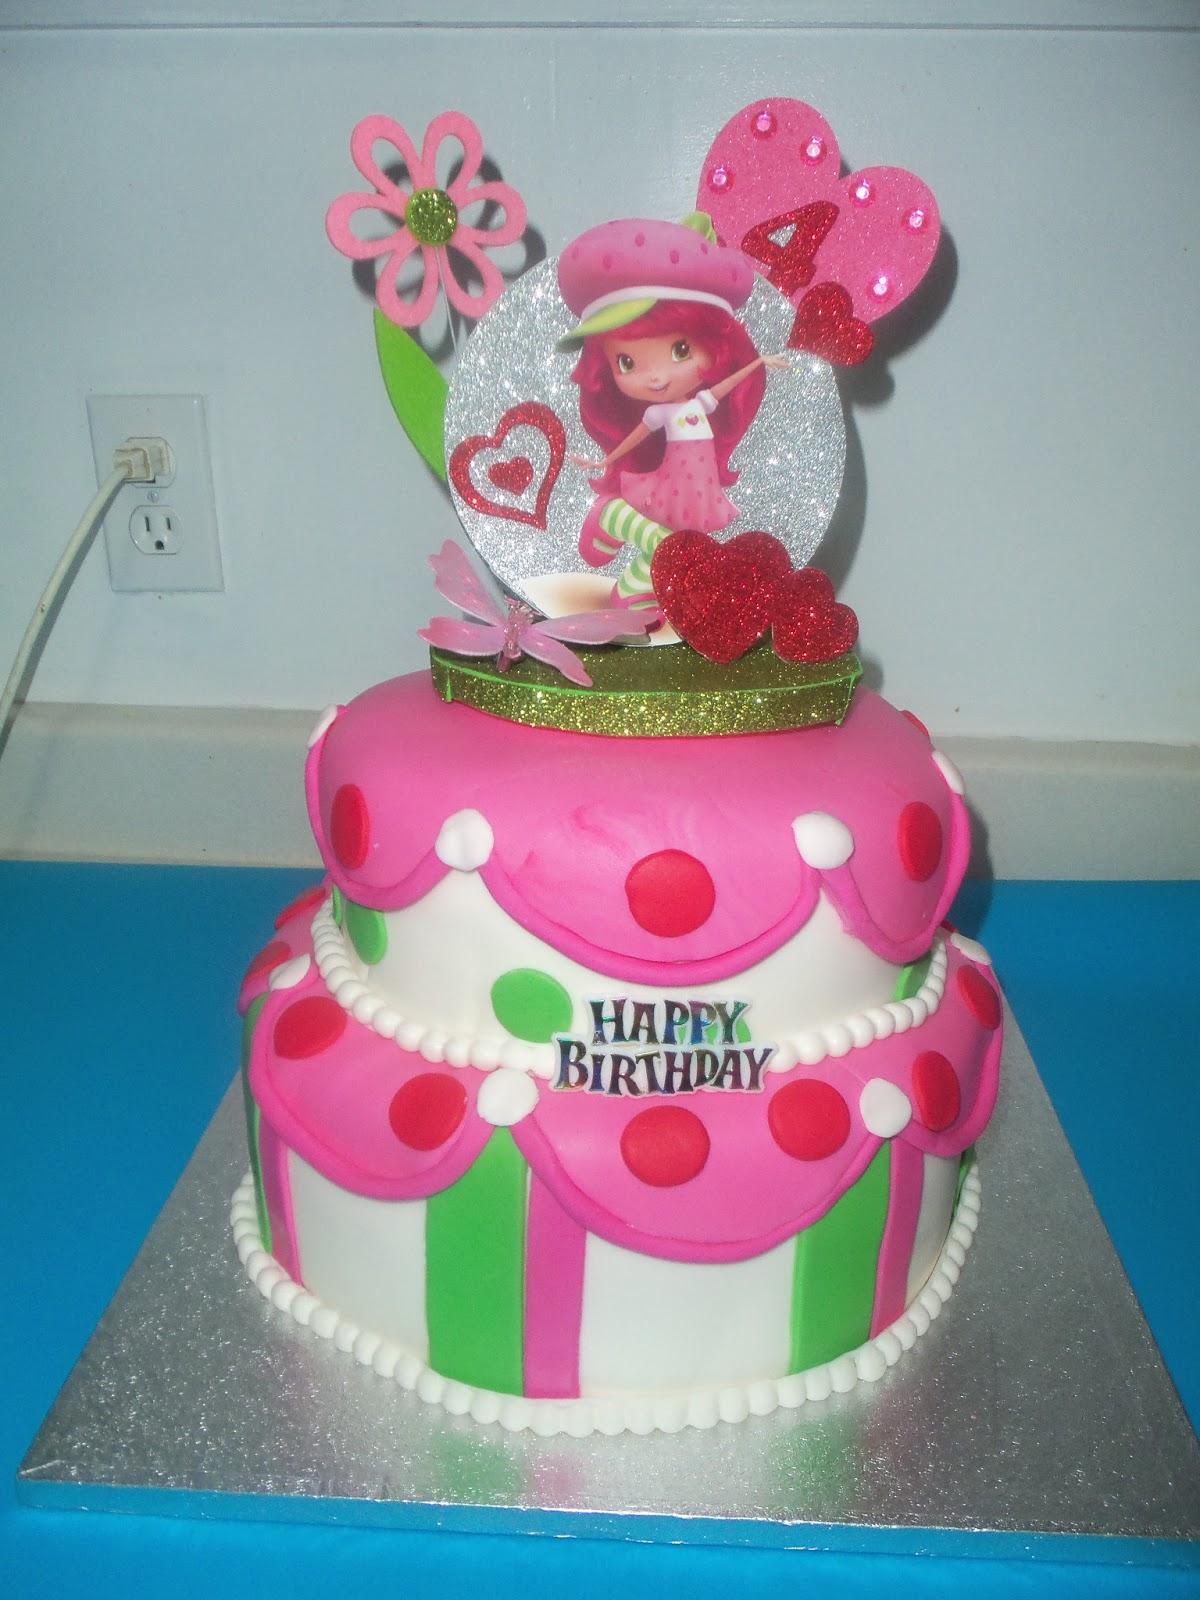 SugarBakers Cake Design